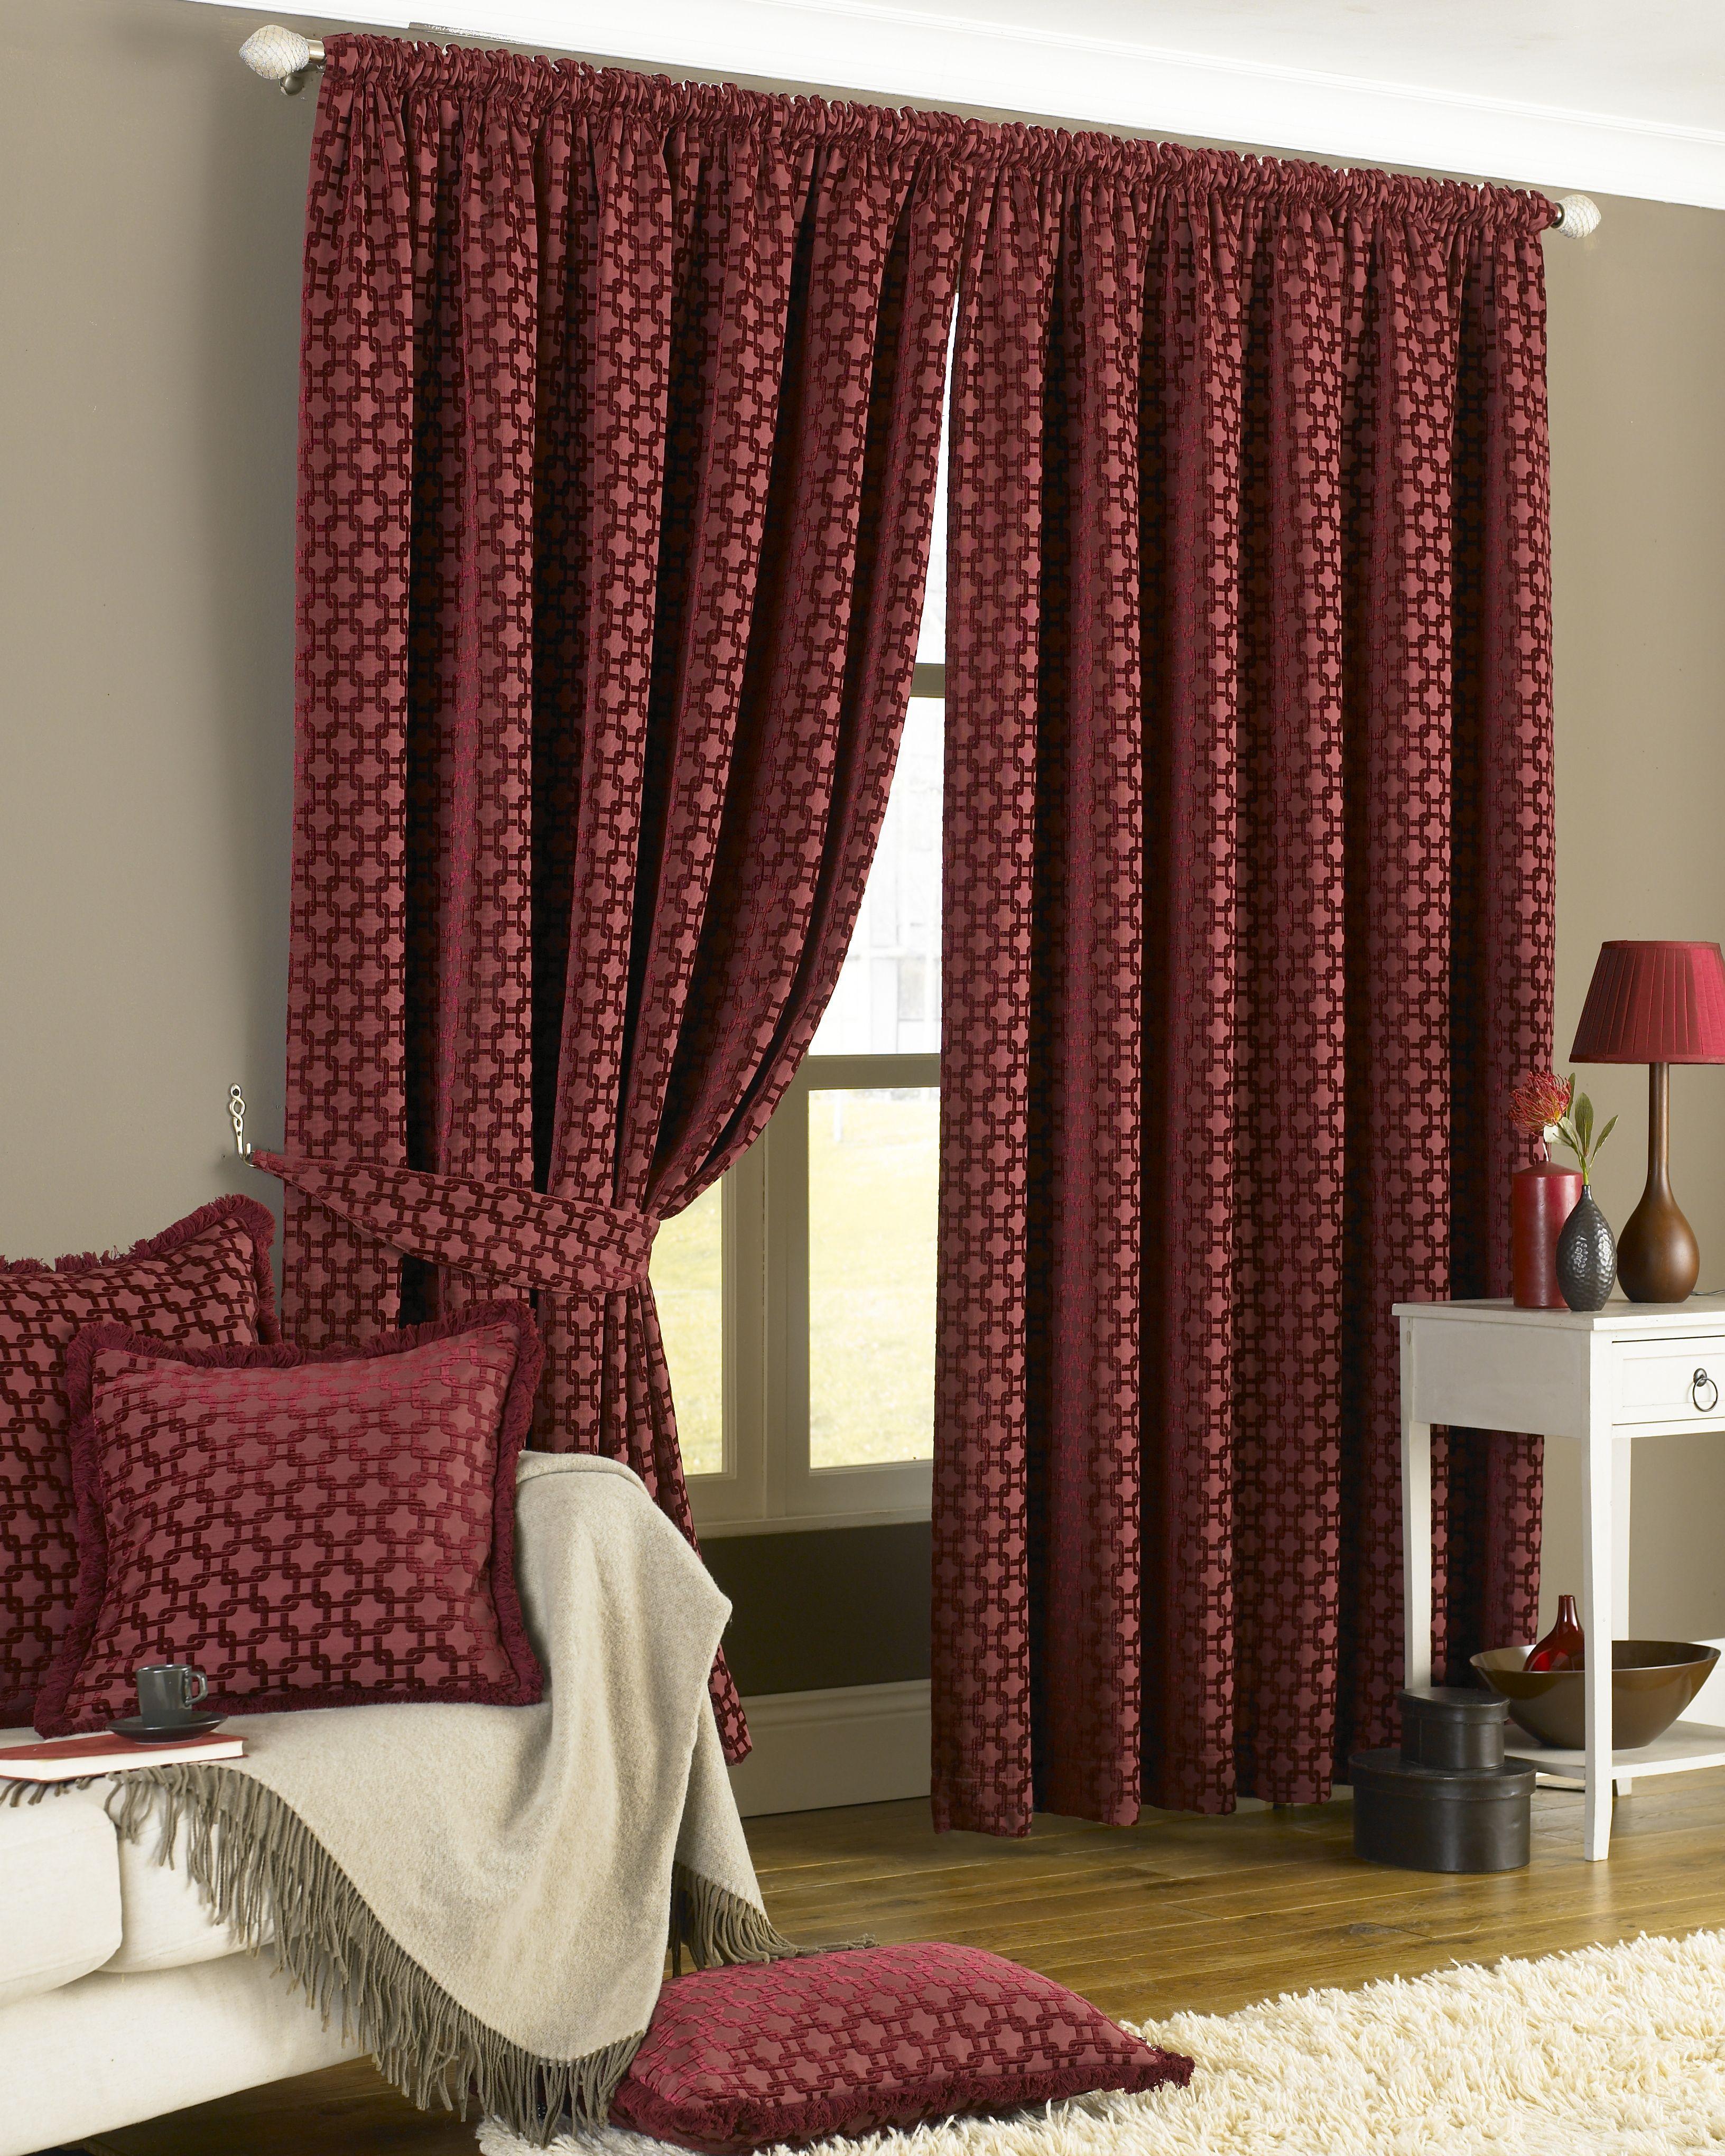 Belmont Chenille Geometric Pencil Pleat Curtains in Claret